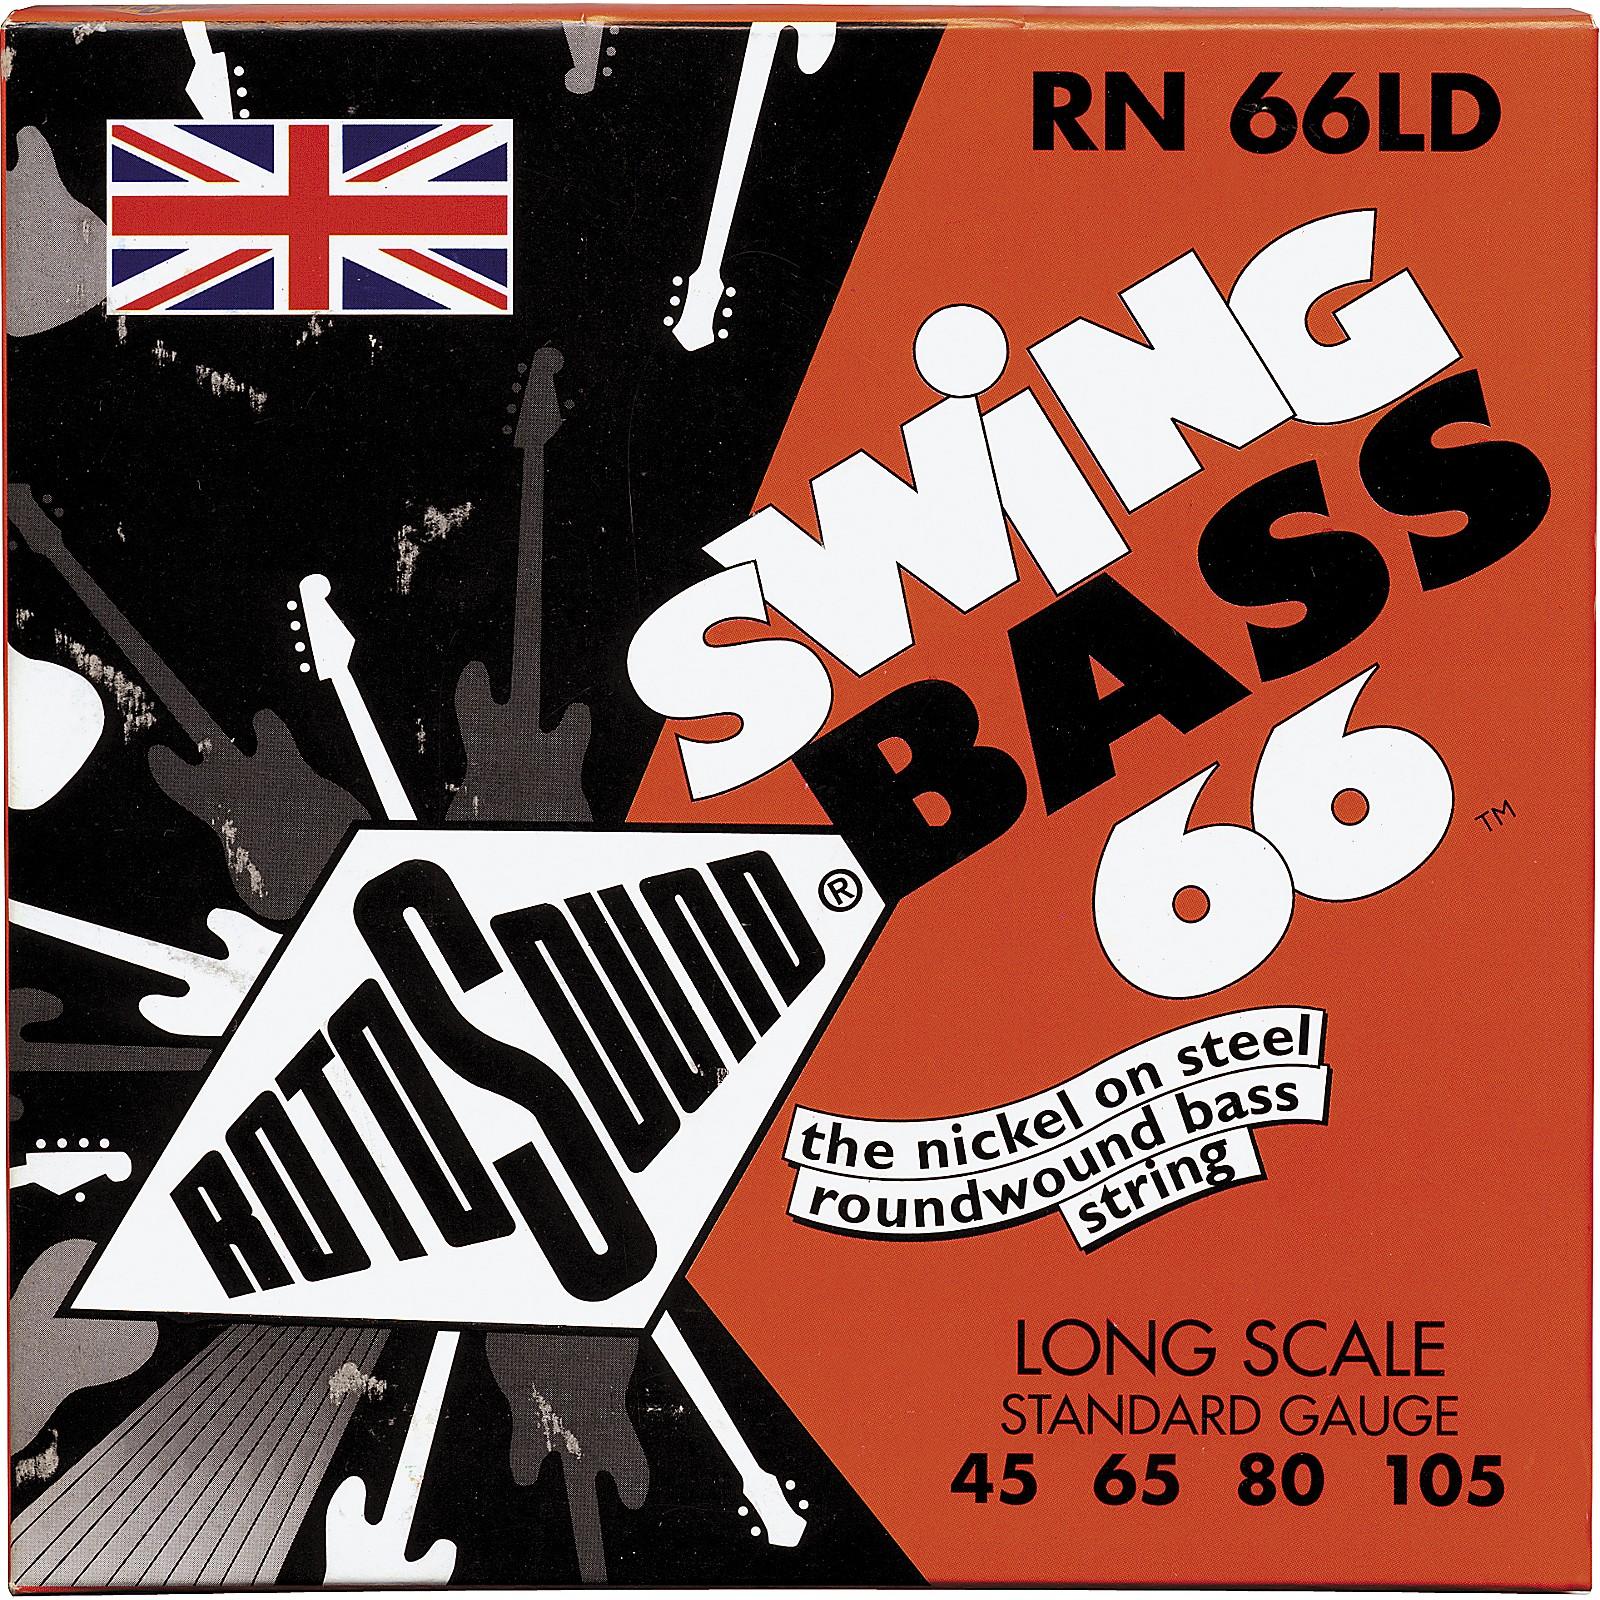 Rotosound RN 66LD Nickel Swing Bass Strings